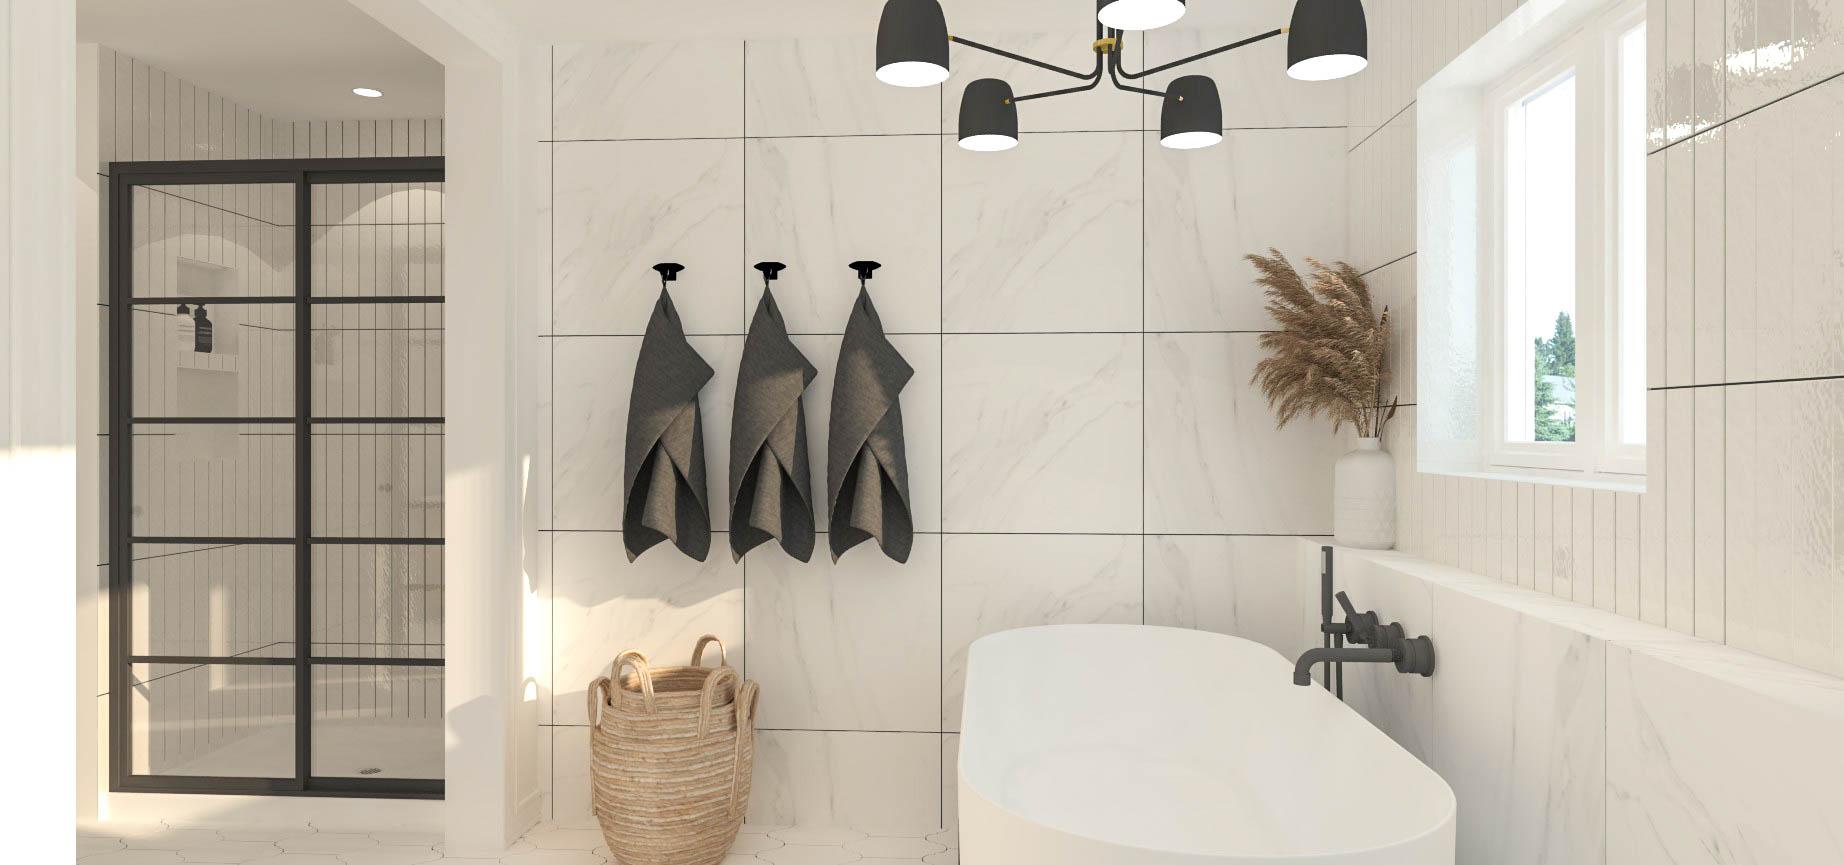 realisation-le-cocooning-modelisation-3d-salle-de-bain